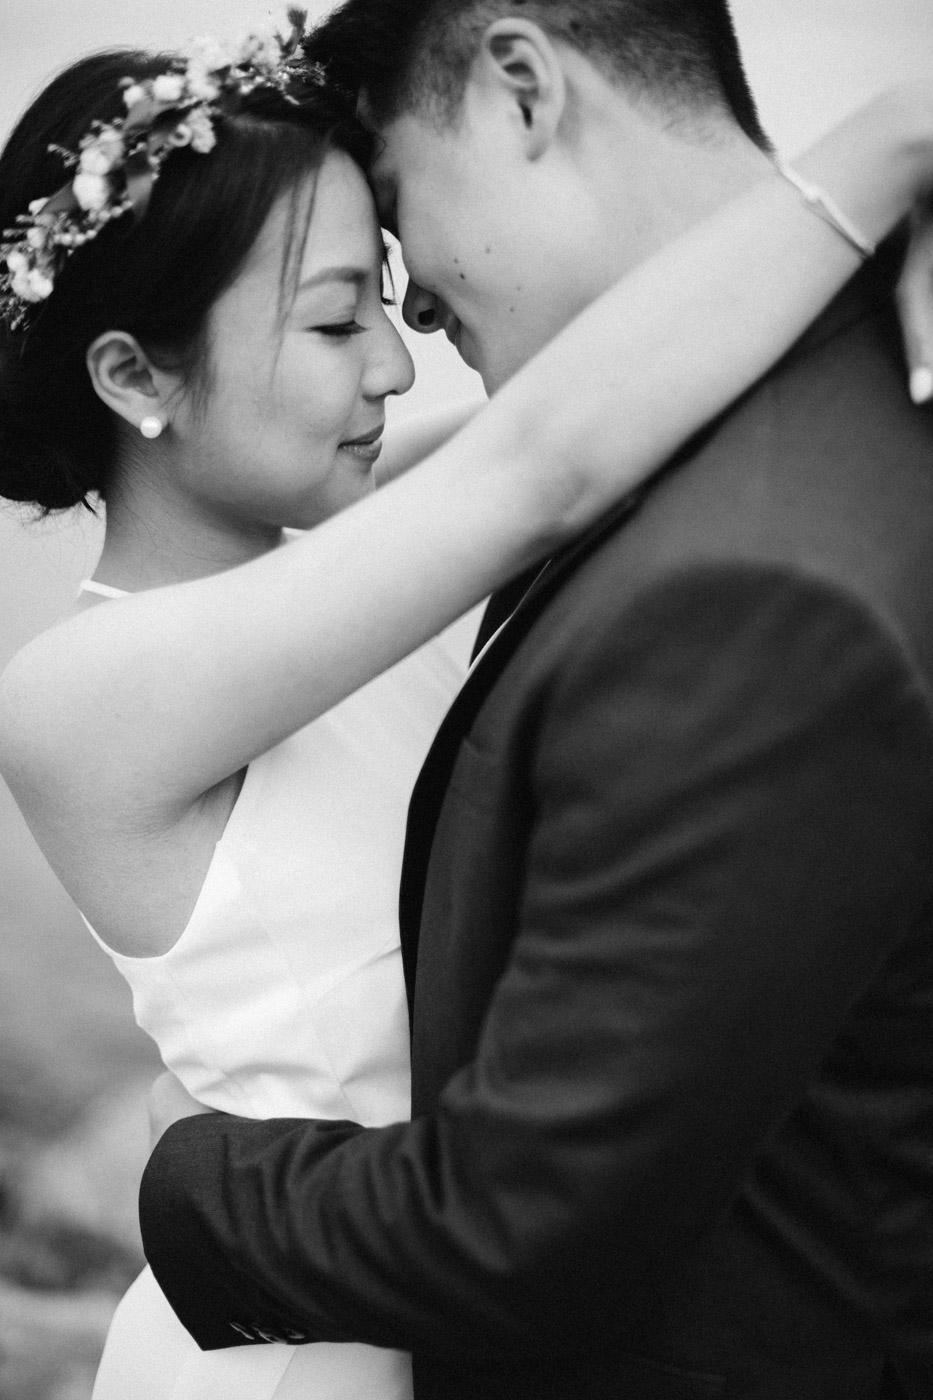 toronto_wedding_photographer_fine_art_documentary 2017-169.jpg